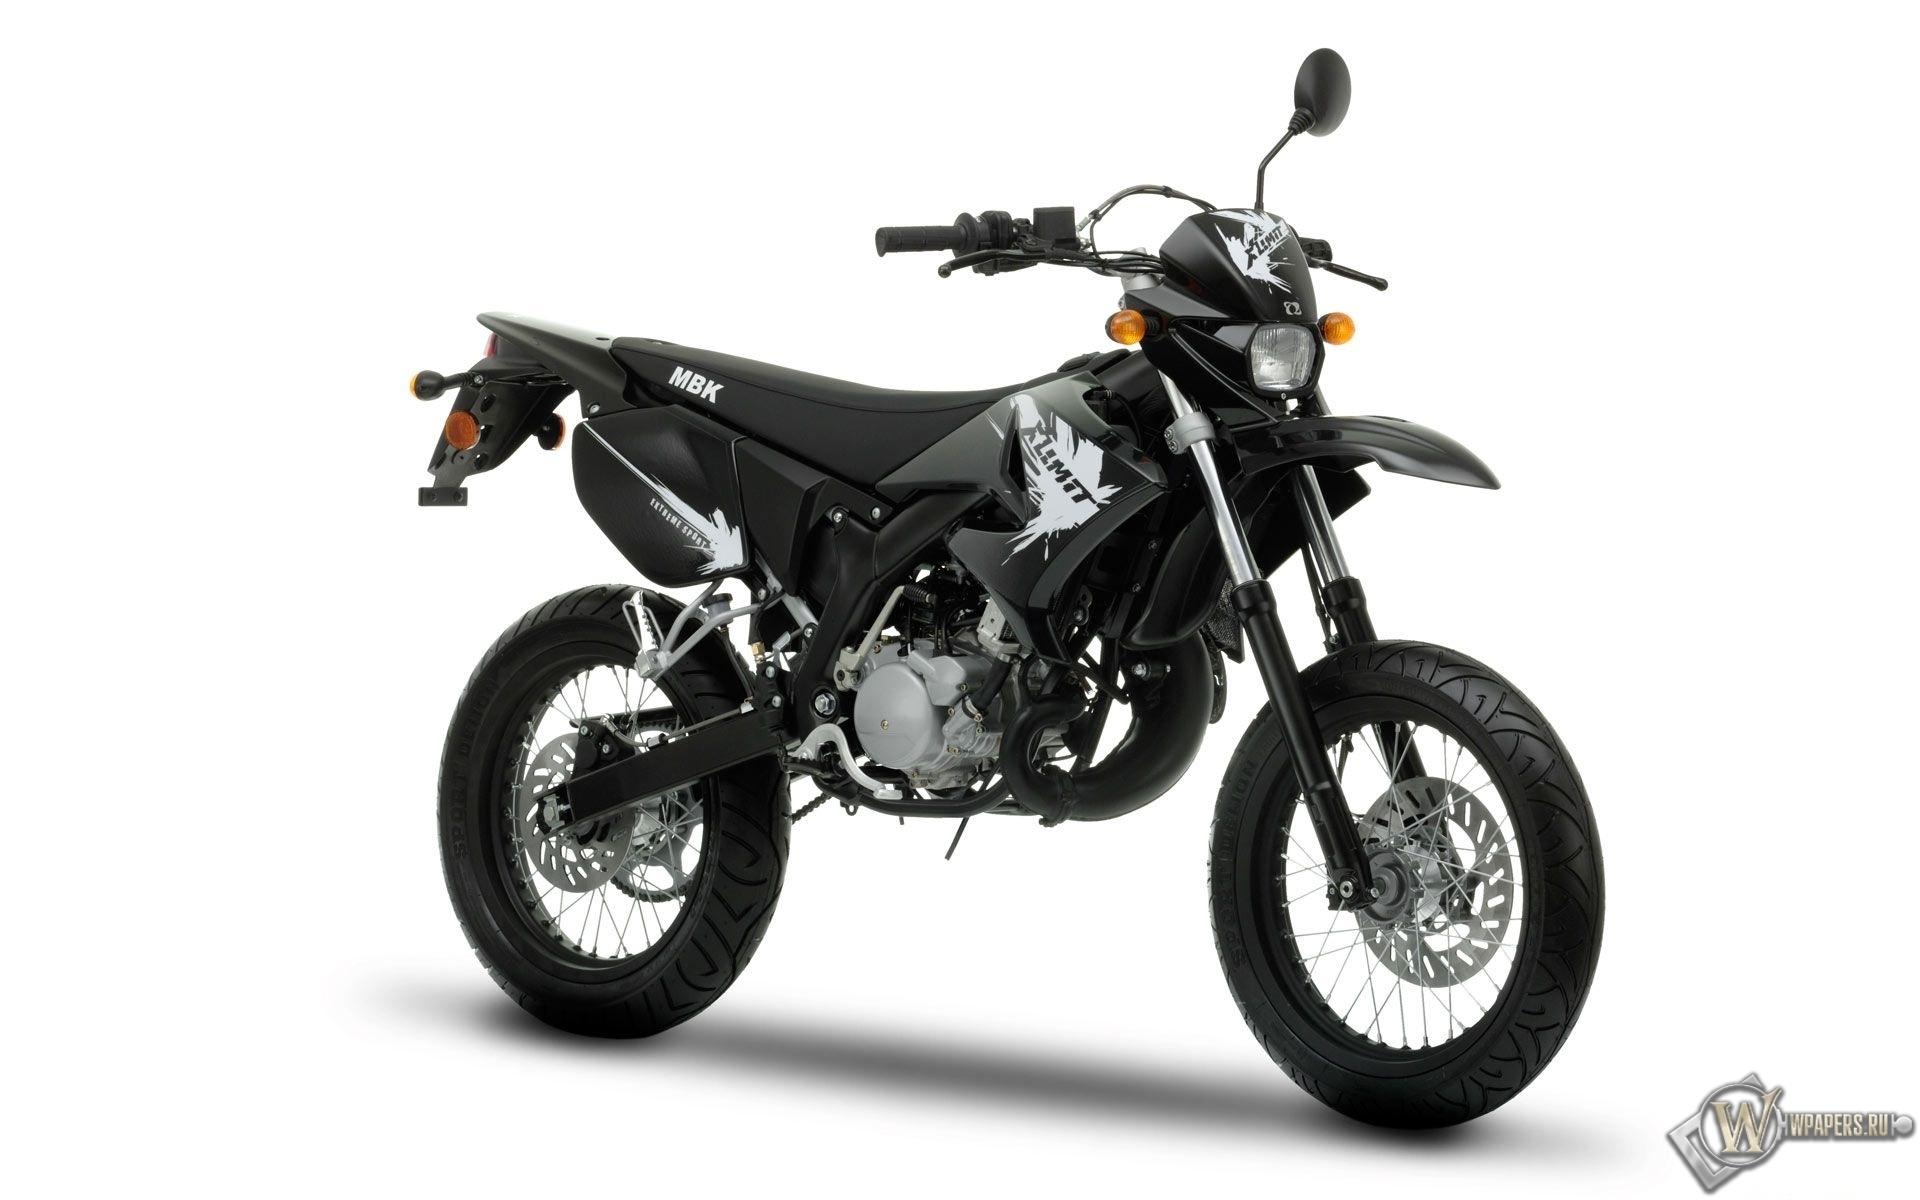 MBK X Limit 1920x1200